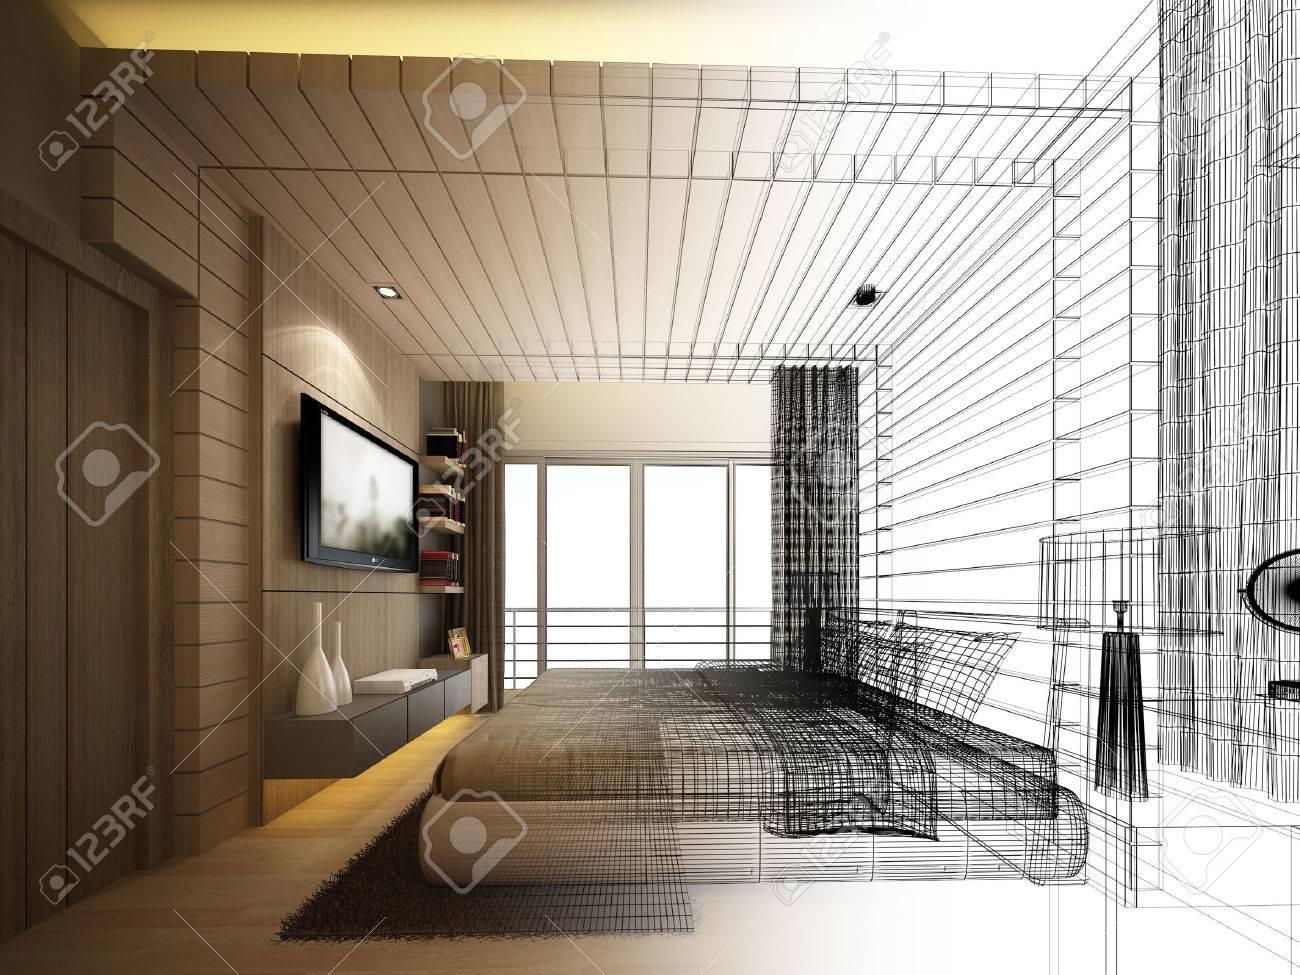 abstract sketch design of interior bedroom - 44148763